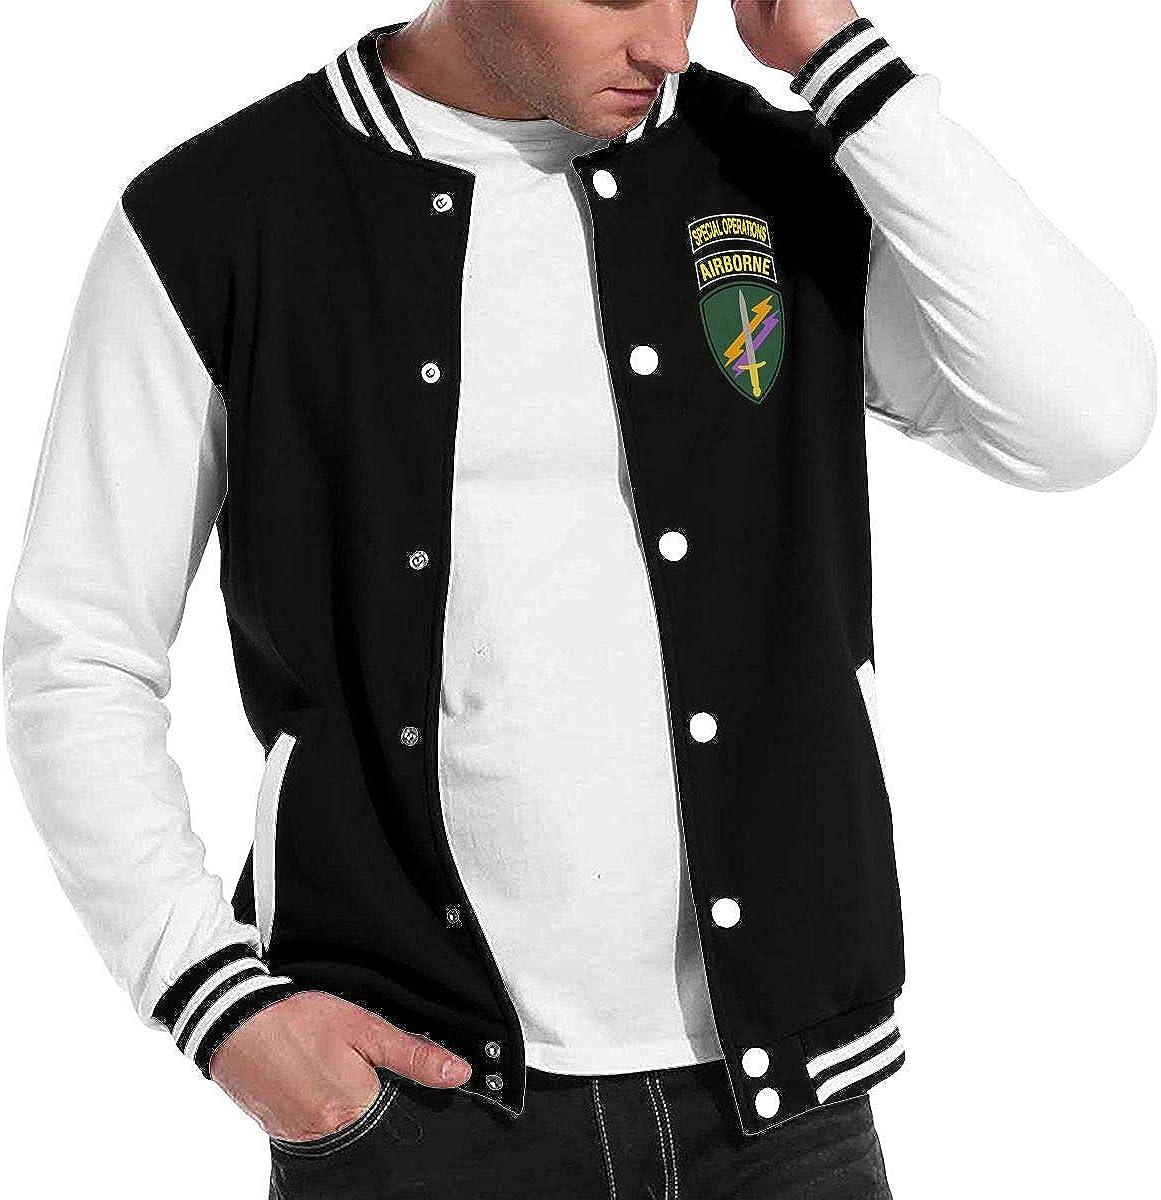 United States Army Special Operations Command Unisex Baseball Uniform Jacket Sweatshirt Sport Coat